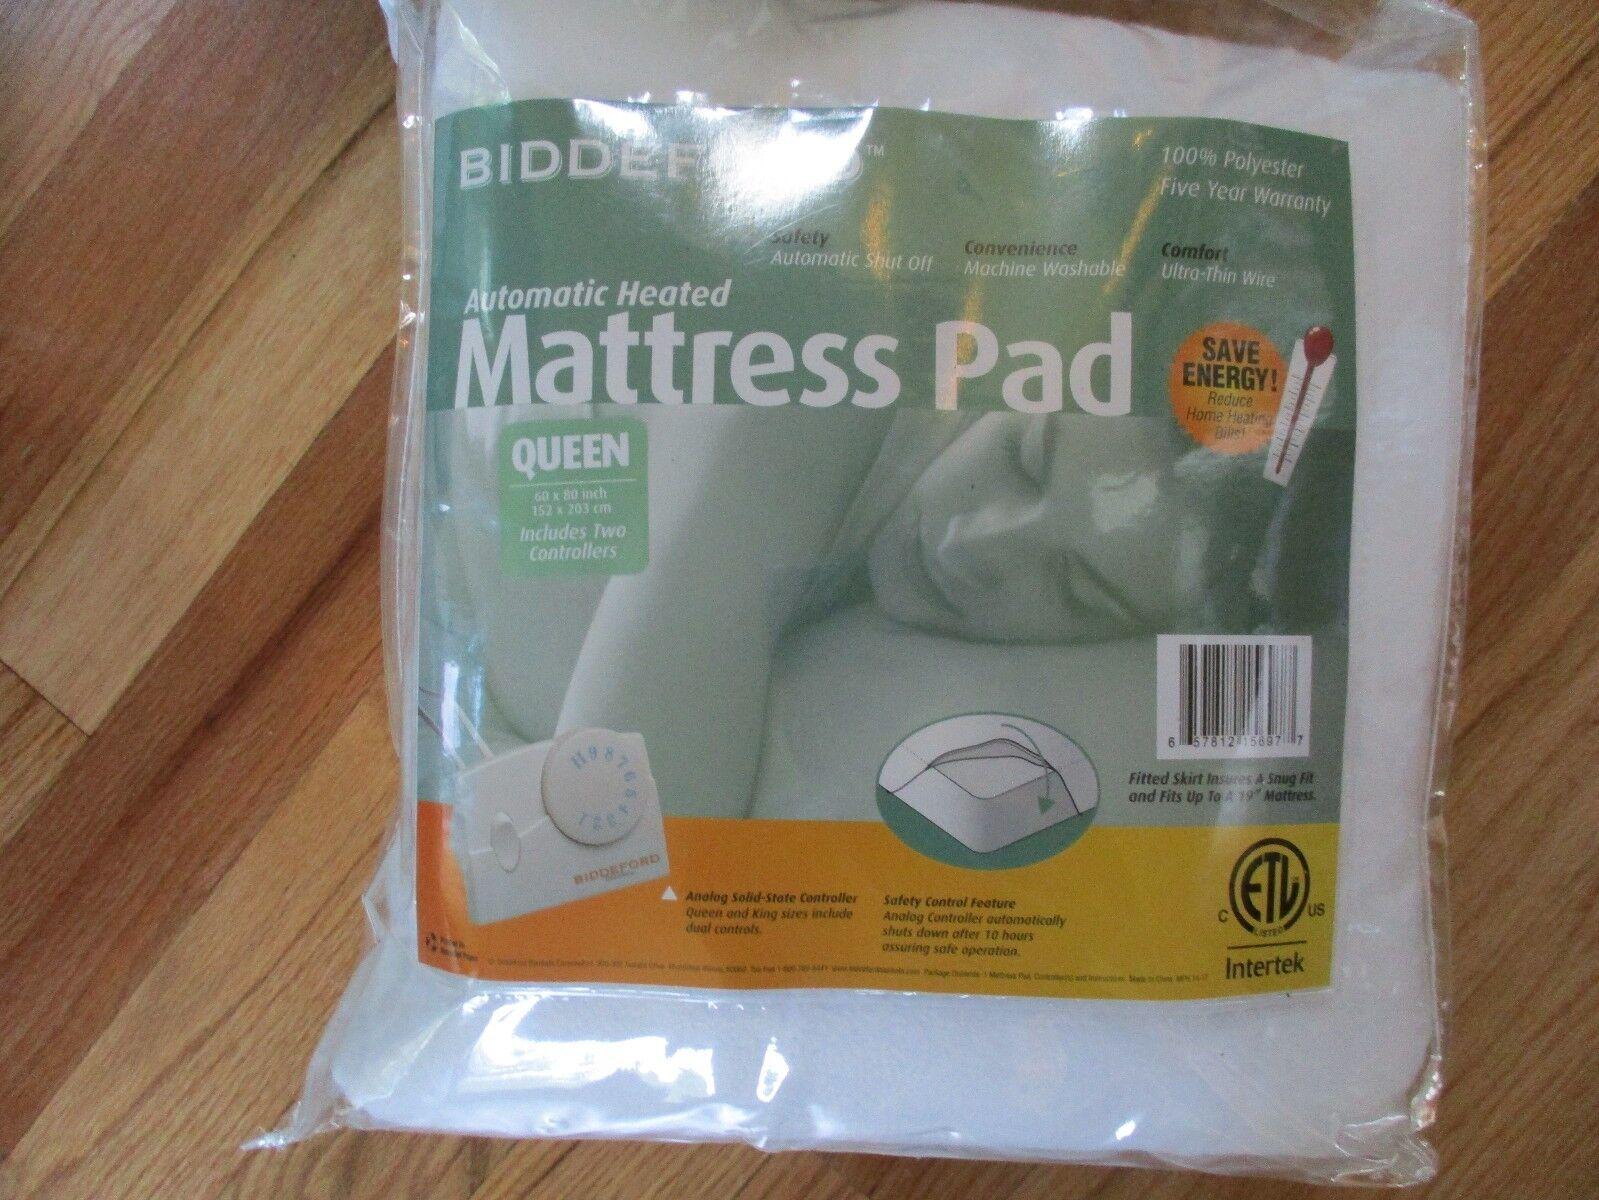 Biddeford Blankets Electric Heated Mattress Pad, Queen brand new DIRECT FACTORY